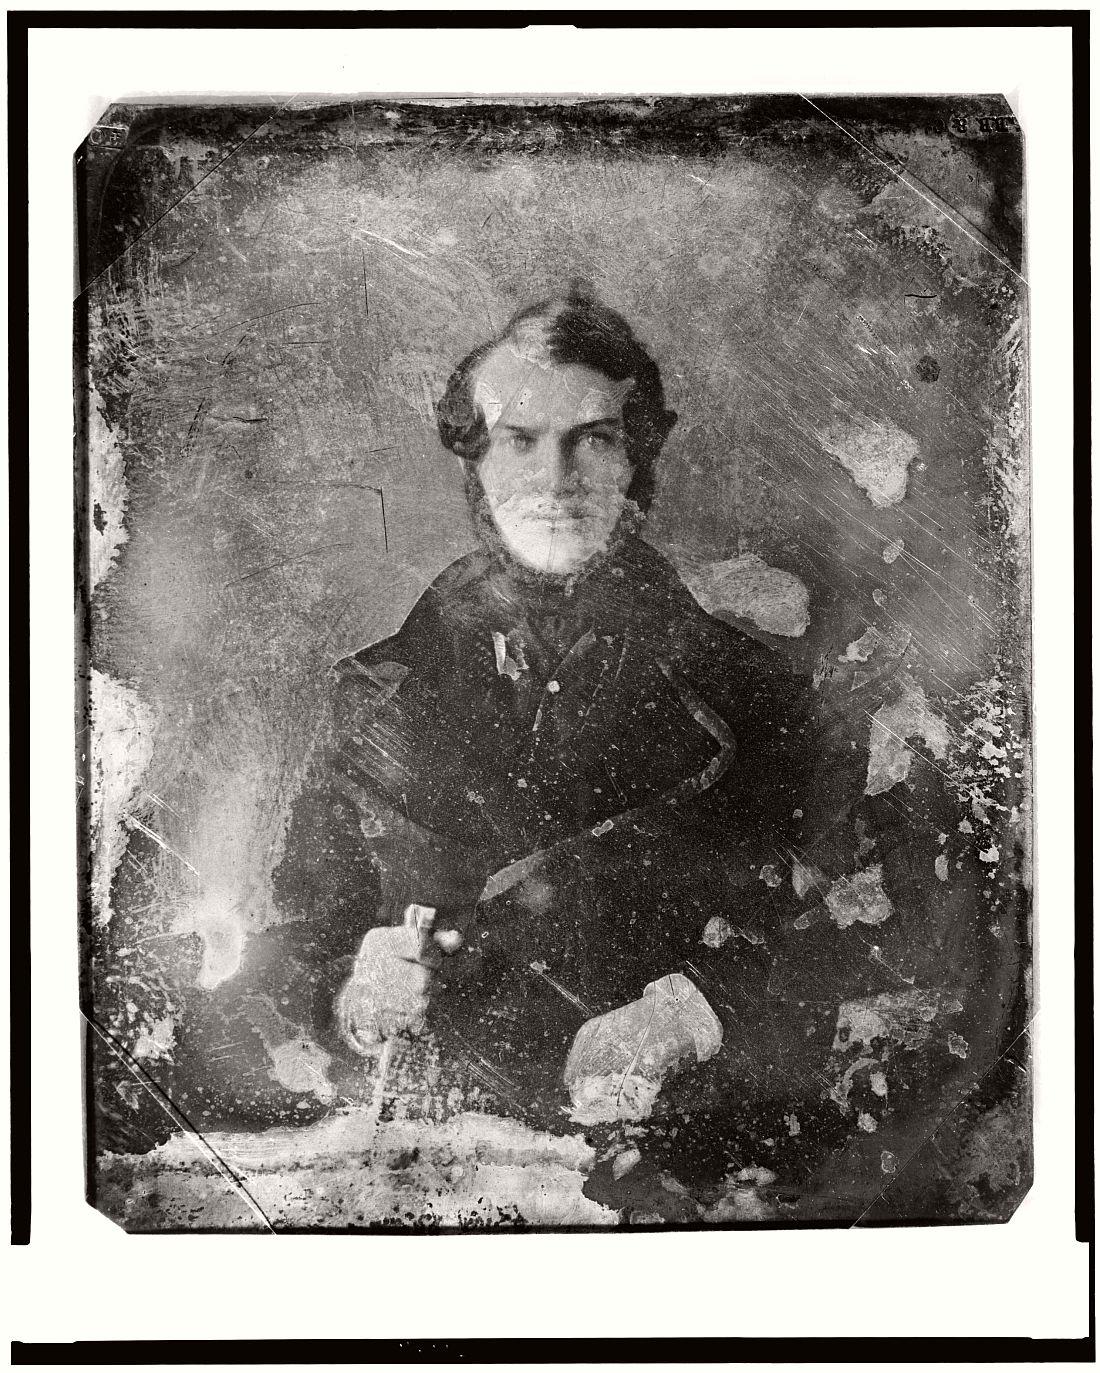 vintage-daguerreotype-portraits-from-xix-century-1844-1860-65